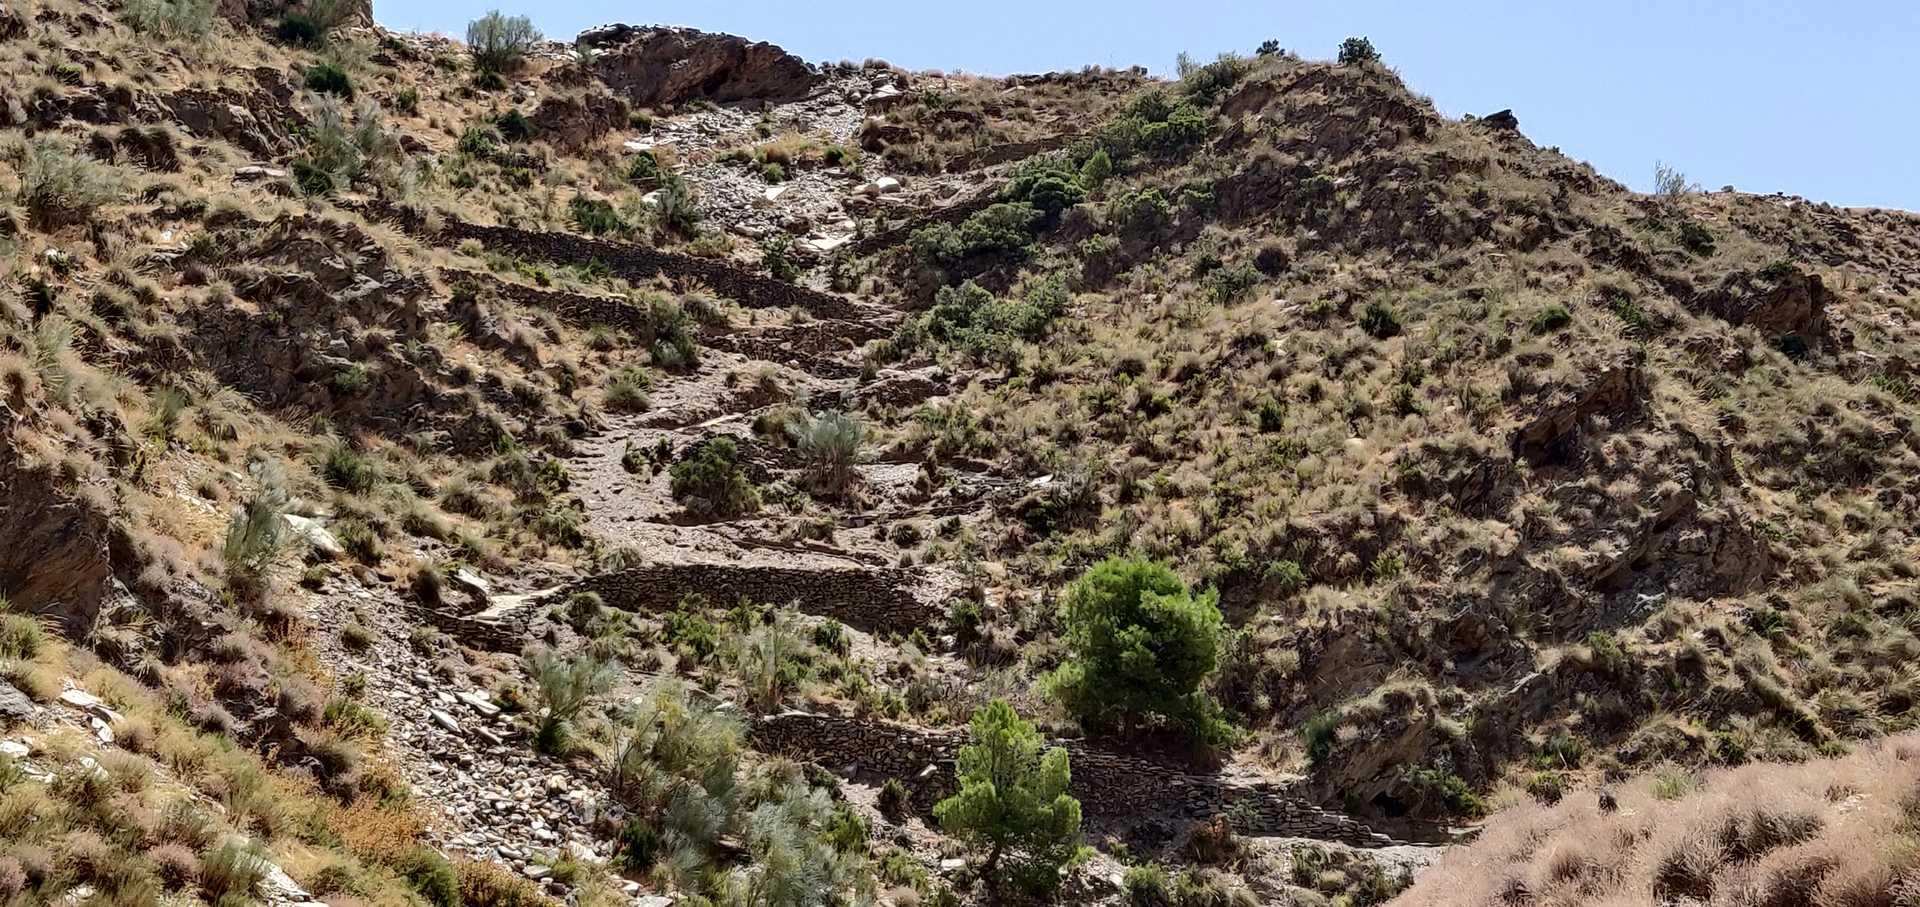 Camino antiguo a Macael Viejo